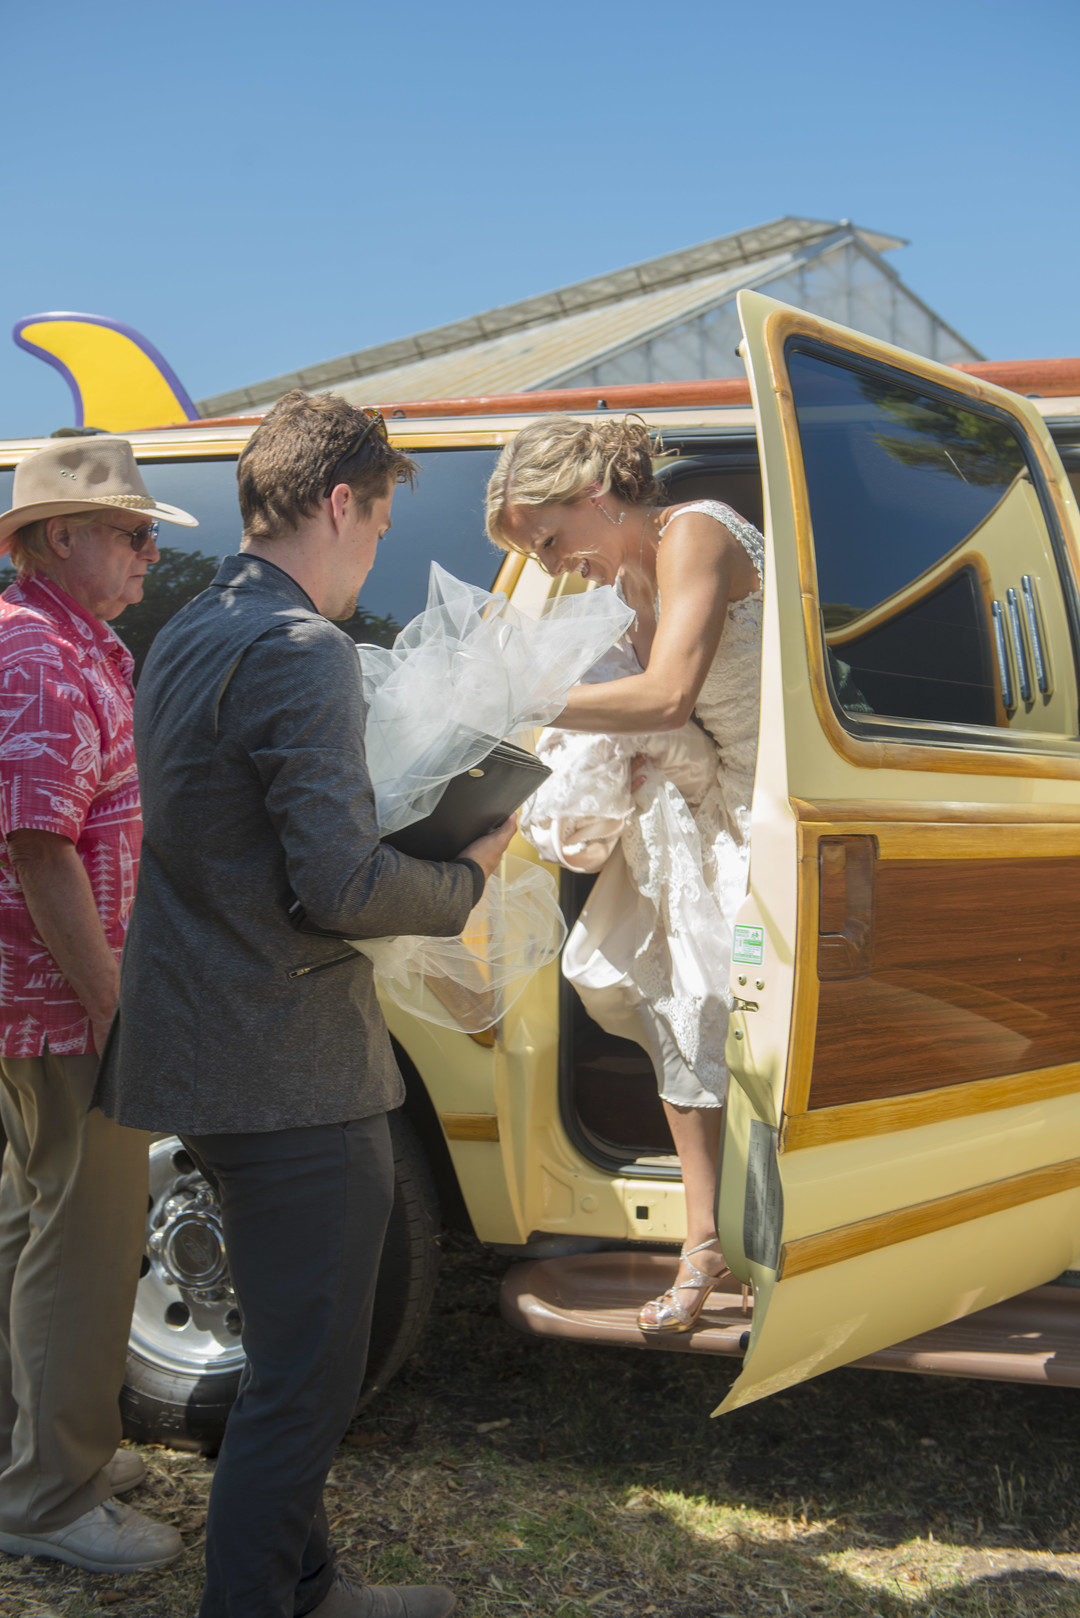 www.santabarbarawedding.com | Venue: Dos Pueblos Ranch | Photographer: ByCherry Photography | Event Designer: Elan Event Rentals | Transportation: Jump on the School Bus | Bride's Entrance